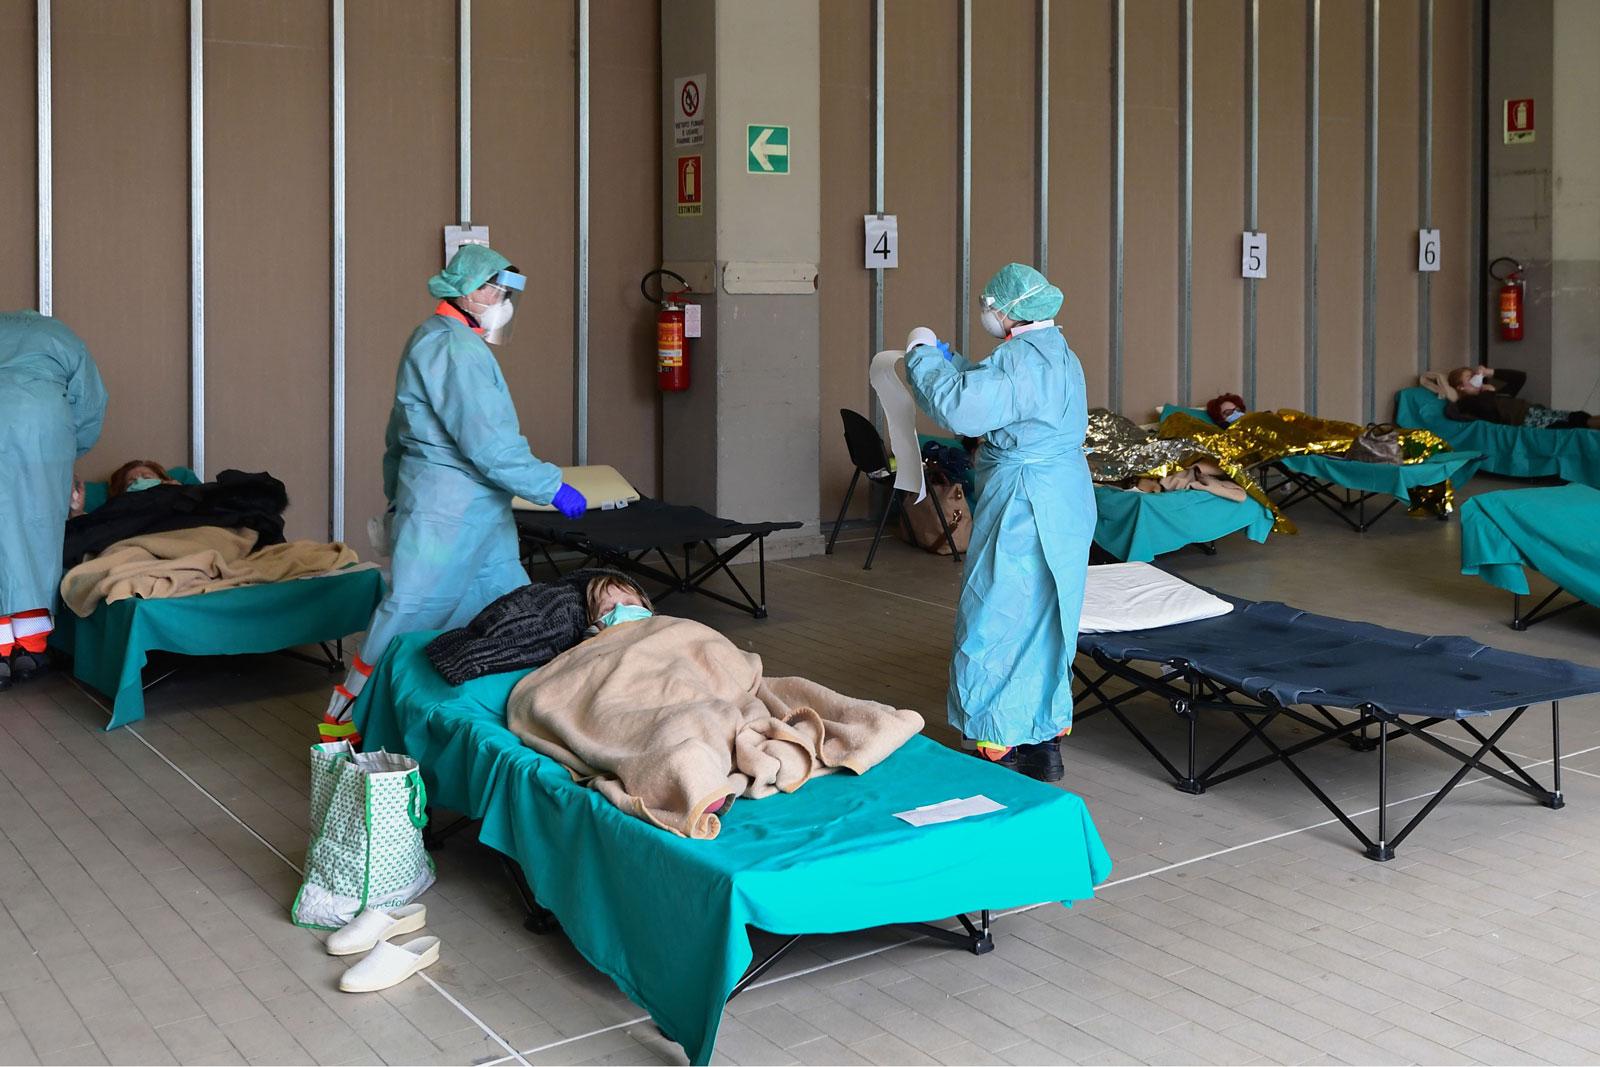 Emergency coronavirus ward in Italy